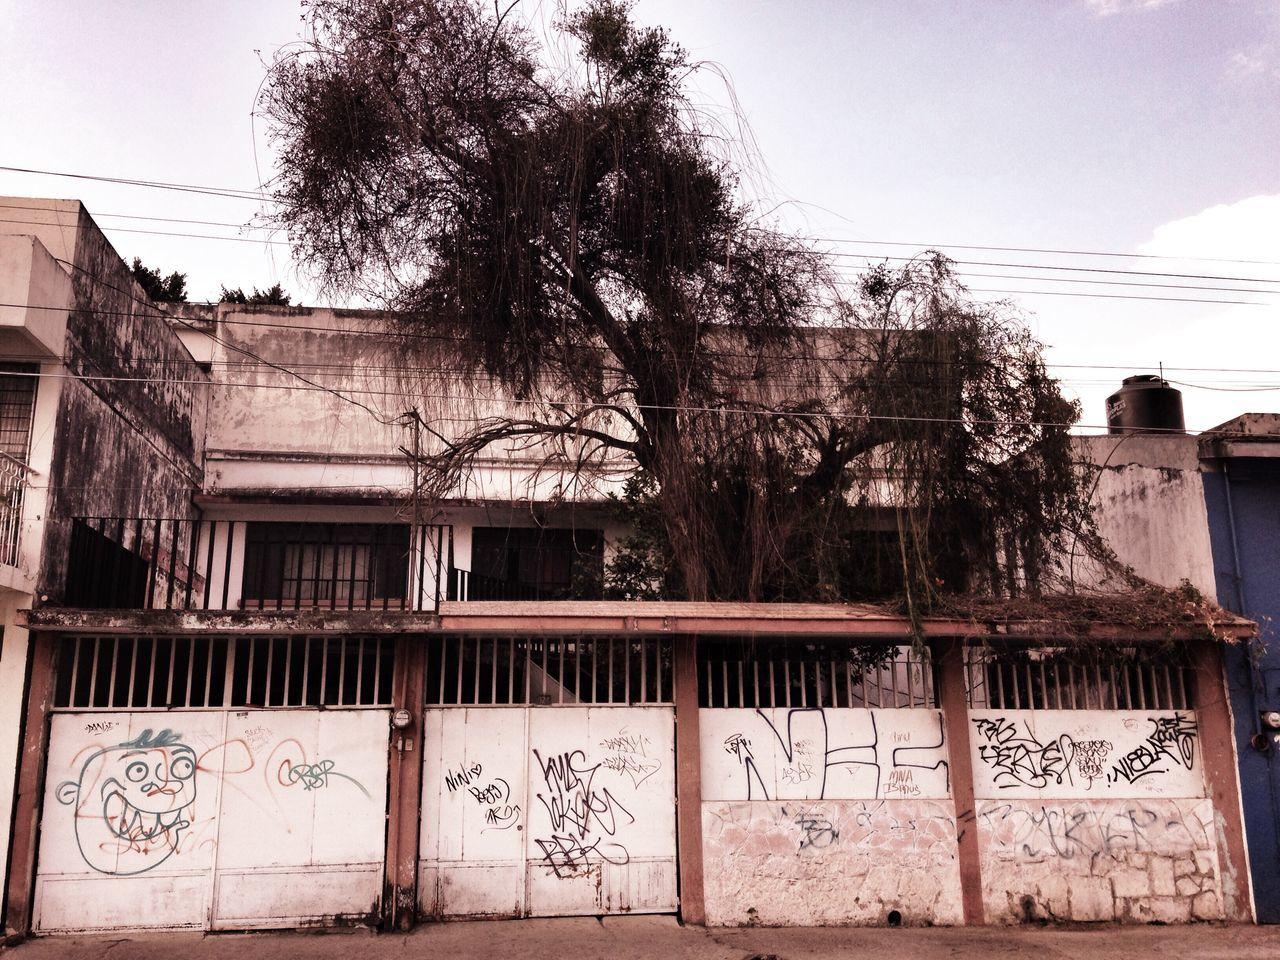 La casa del árbol Streetphotography IPhoneography Urban@ndante